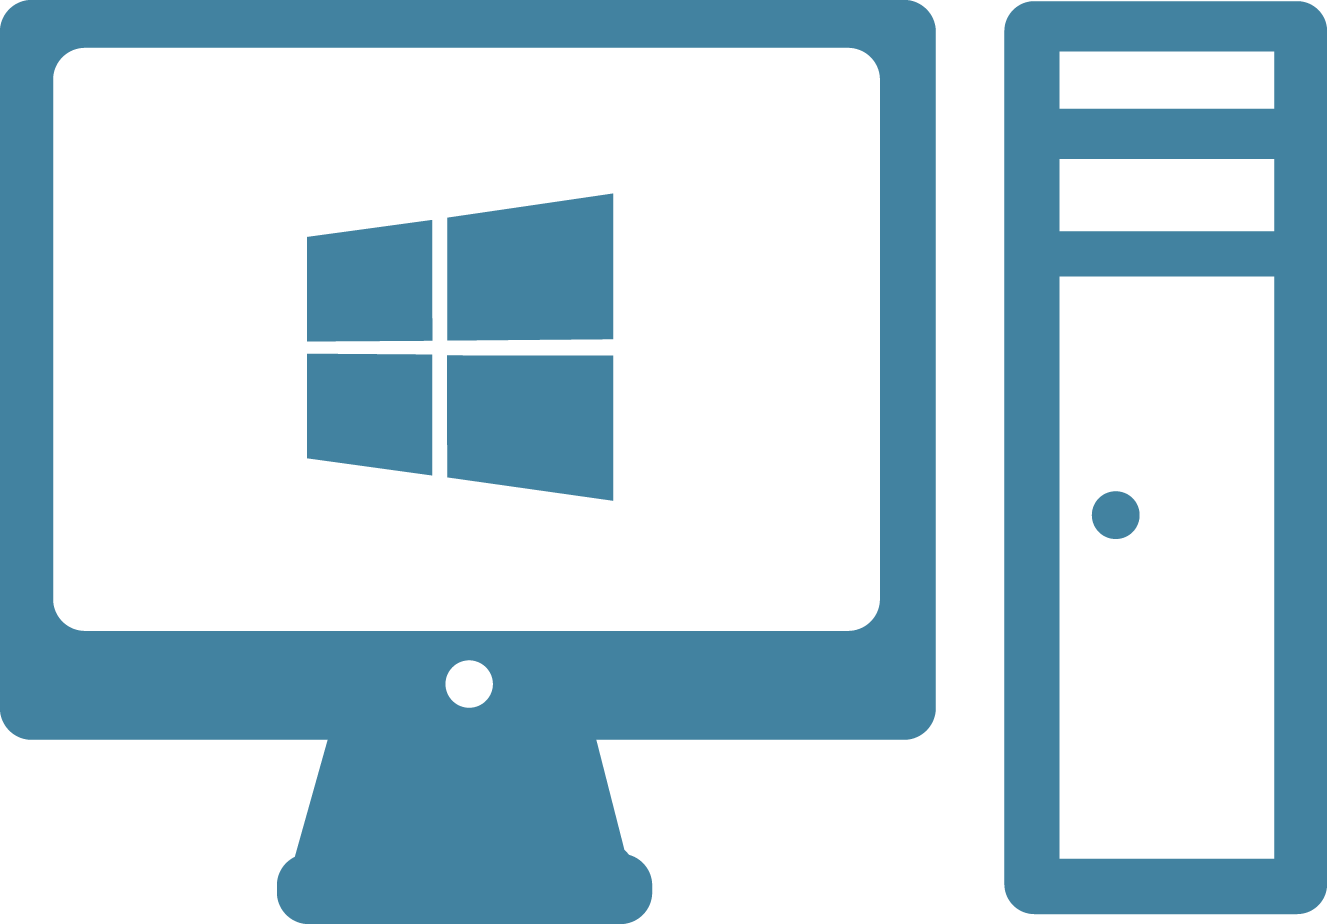 Поставка IT-оборудования